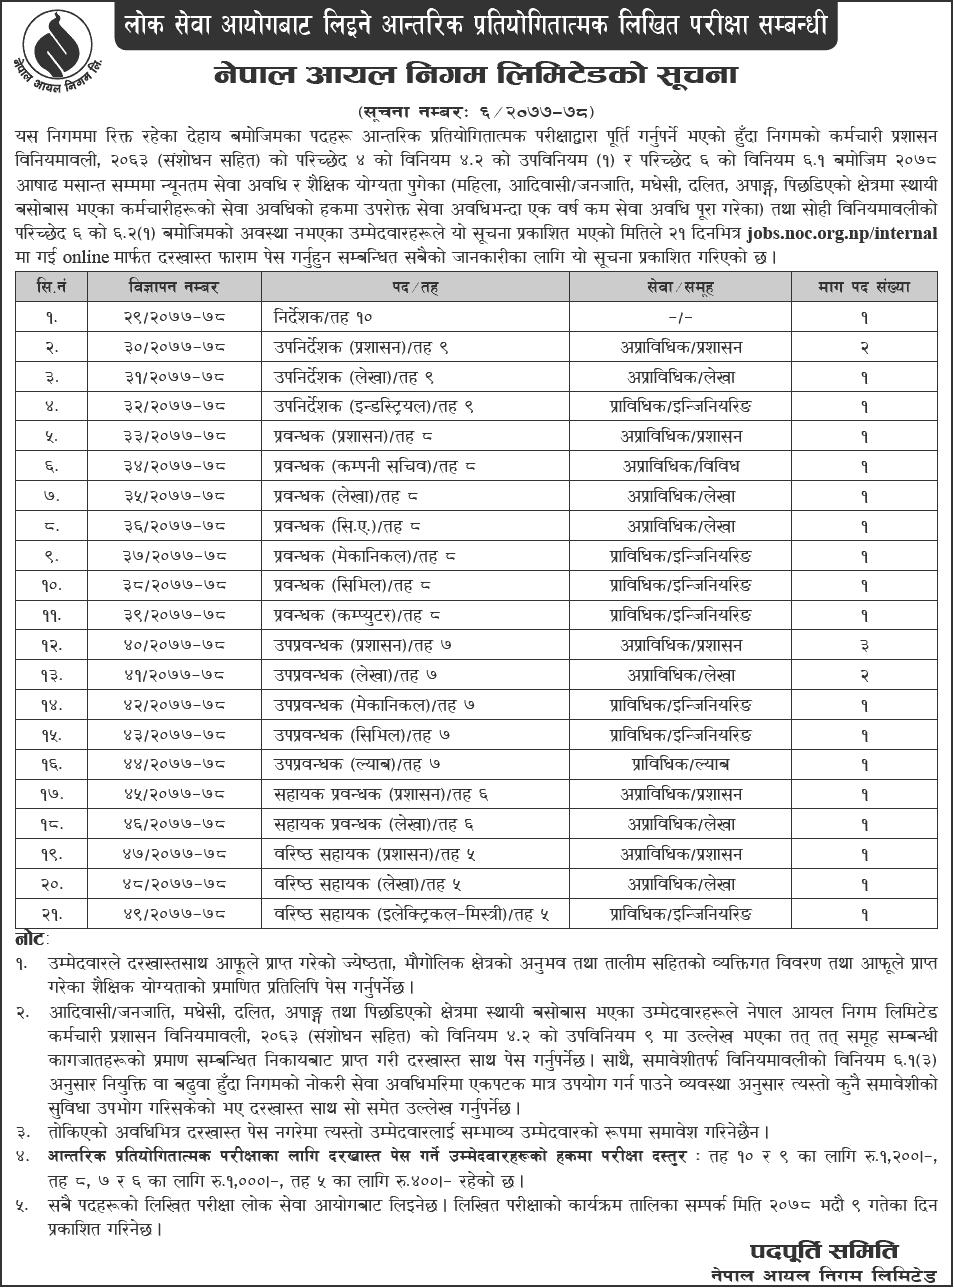 NOC Internal Competition Vacancy Details